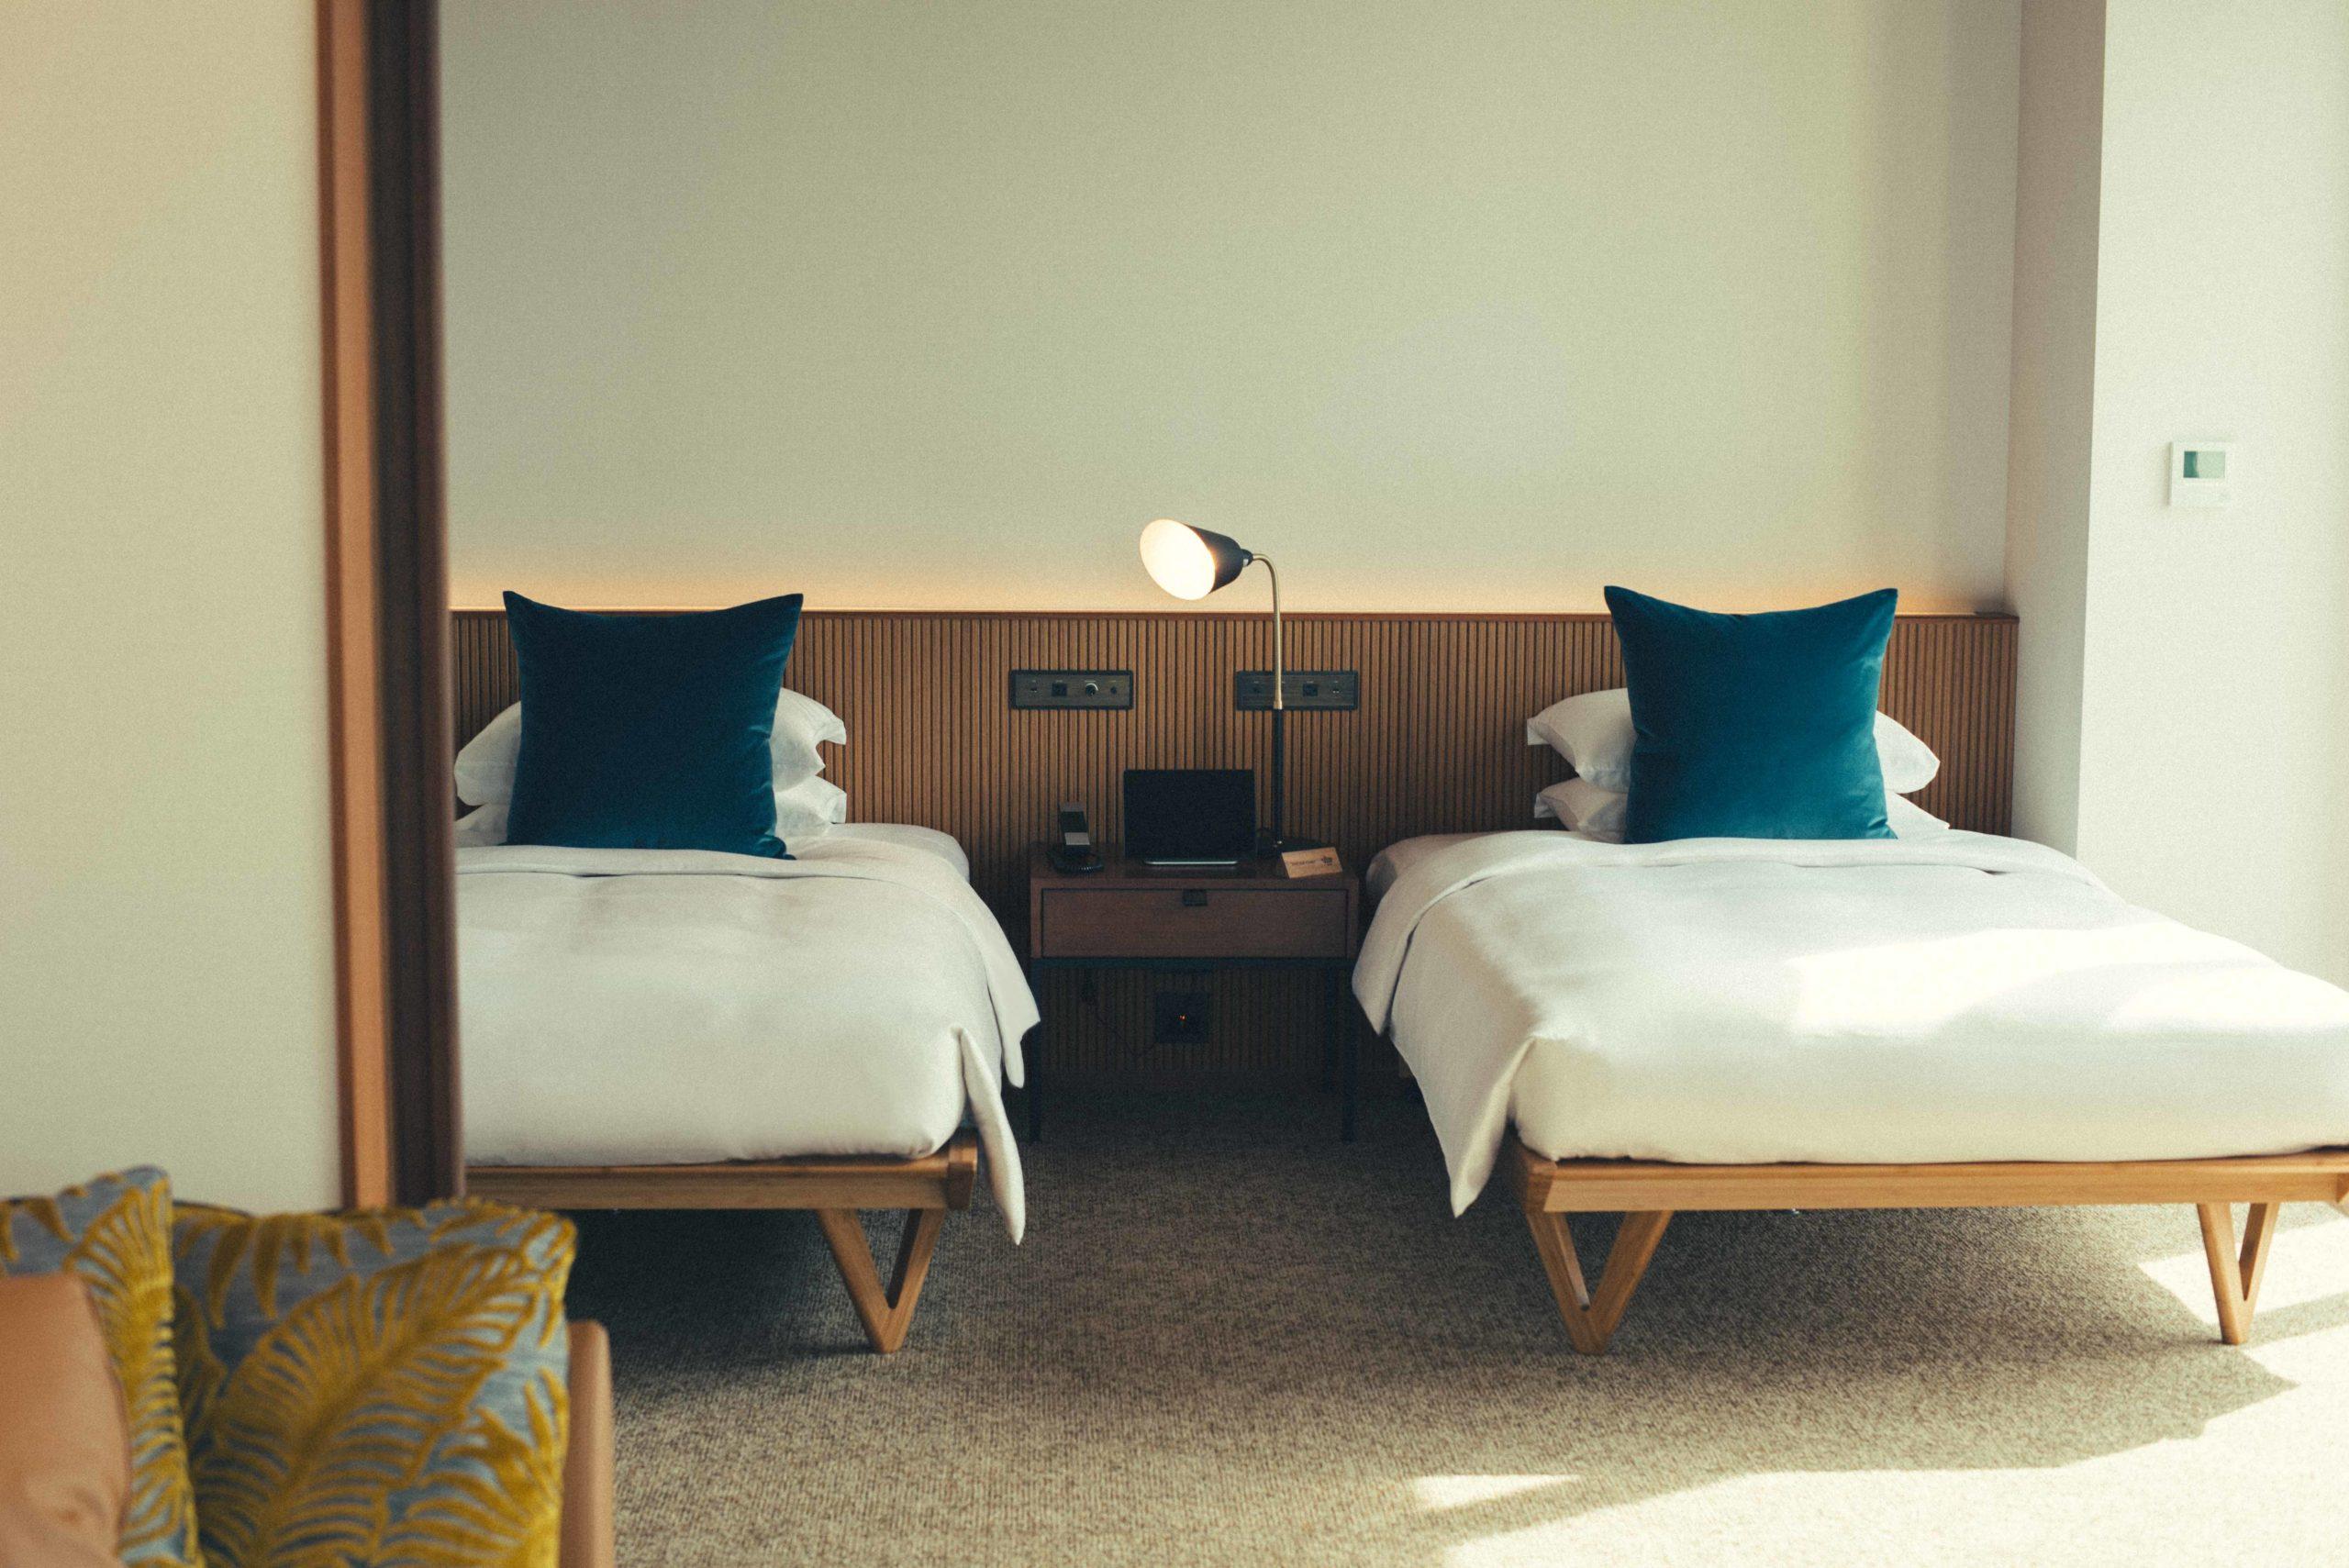 THE AOYAMA GRAND HOTEL 青山グランドホテル